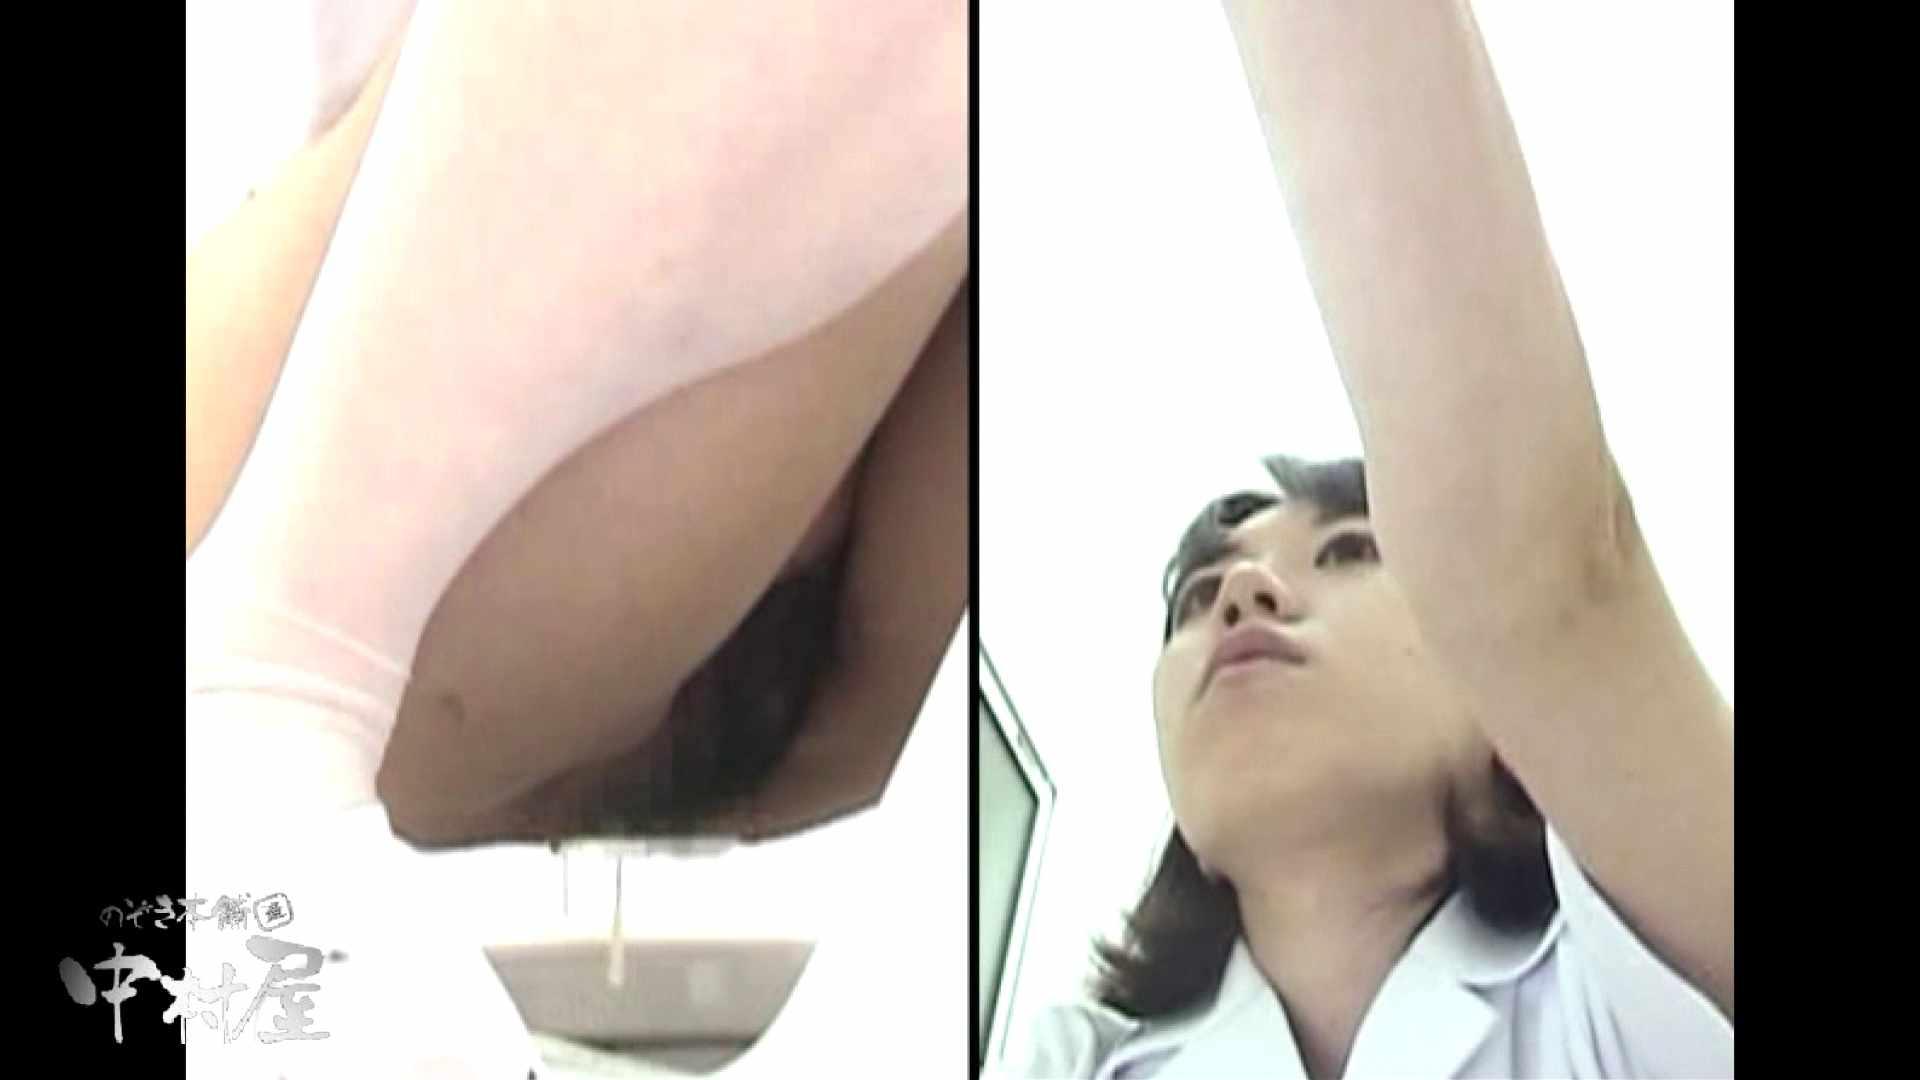 都内某大学病院編 和式イ更所盗撮 その⑥ 3名 放尿 性交動画流出 105pic 89